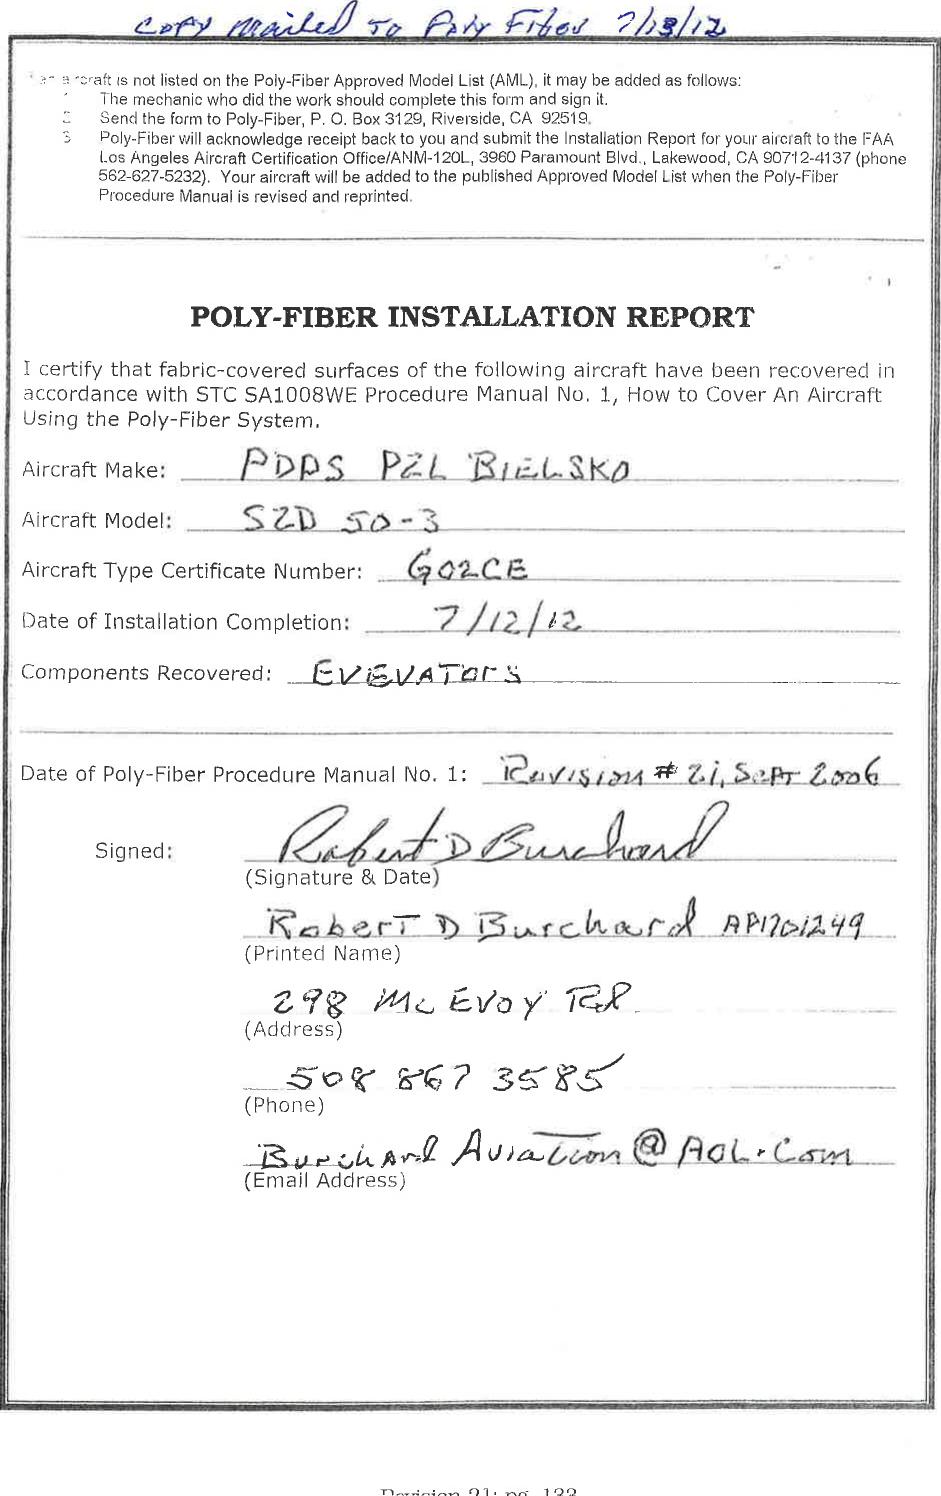 Szd 50 3 Puchacz Form 337 Major Repair